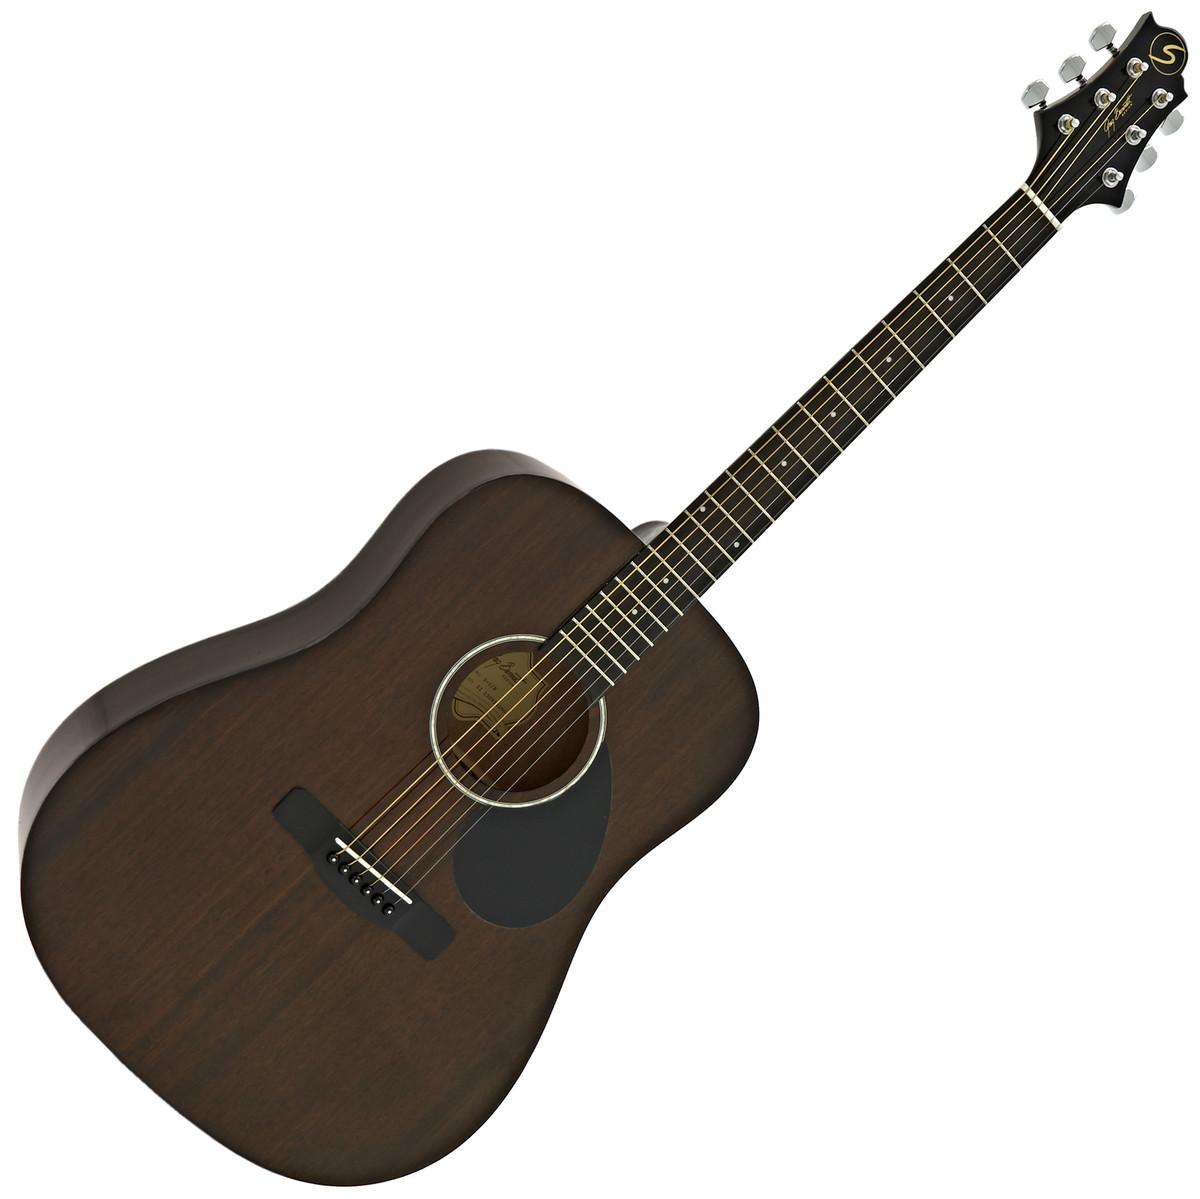 Image of Greg Bennett D-1 Acoustic Guitar Natural